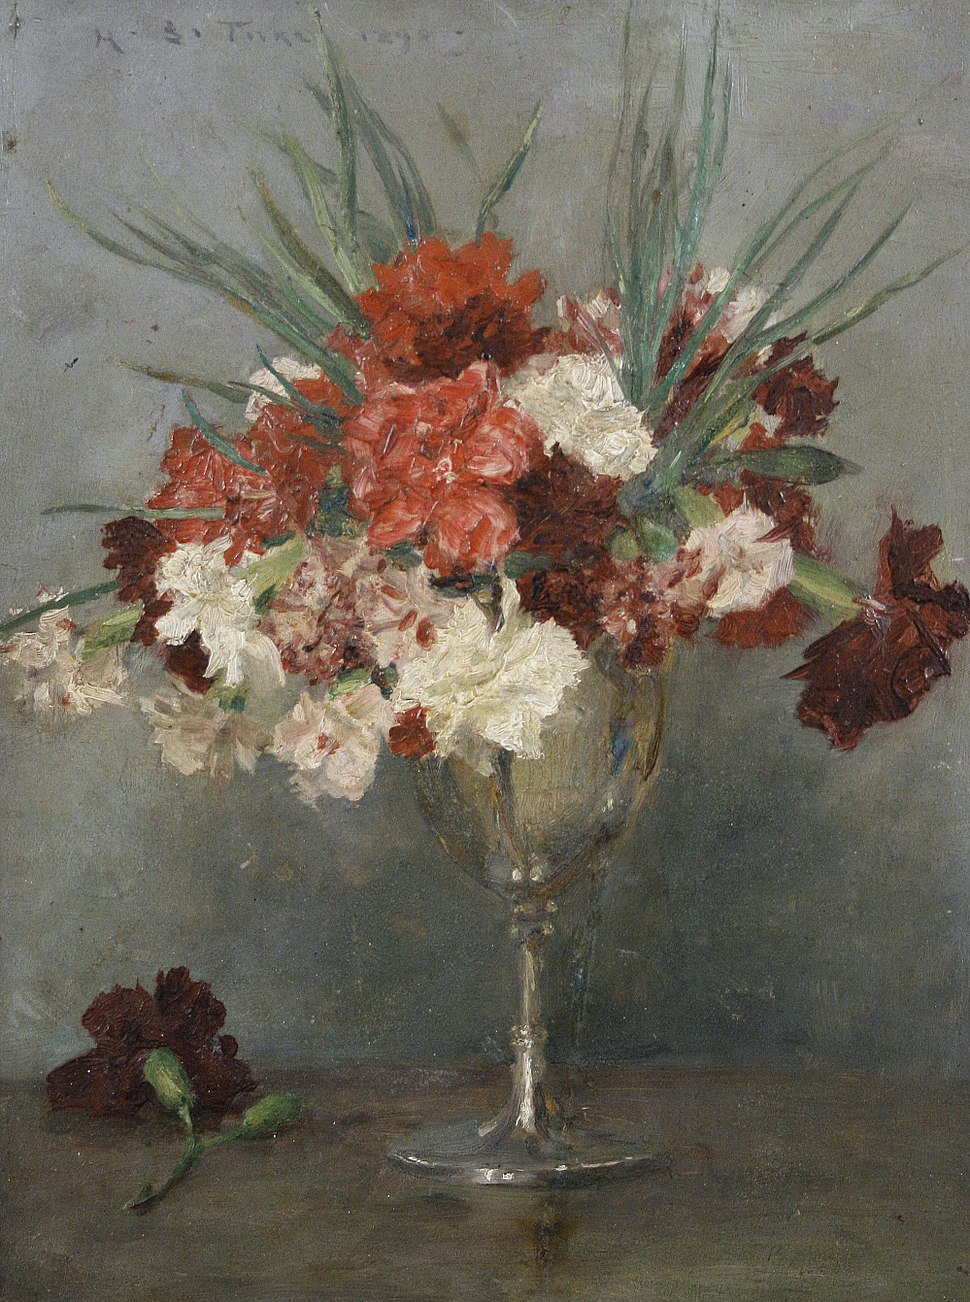 Henry Scott Tuke - Carnations - a study